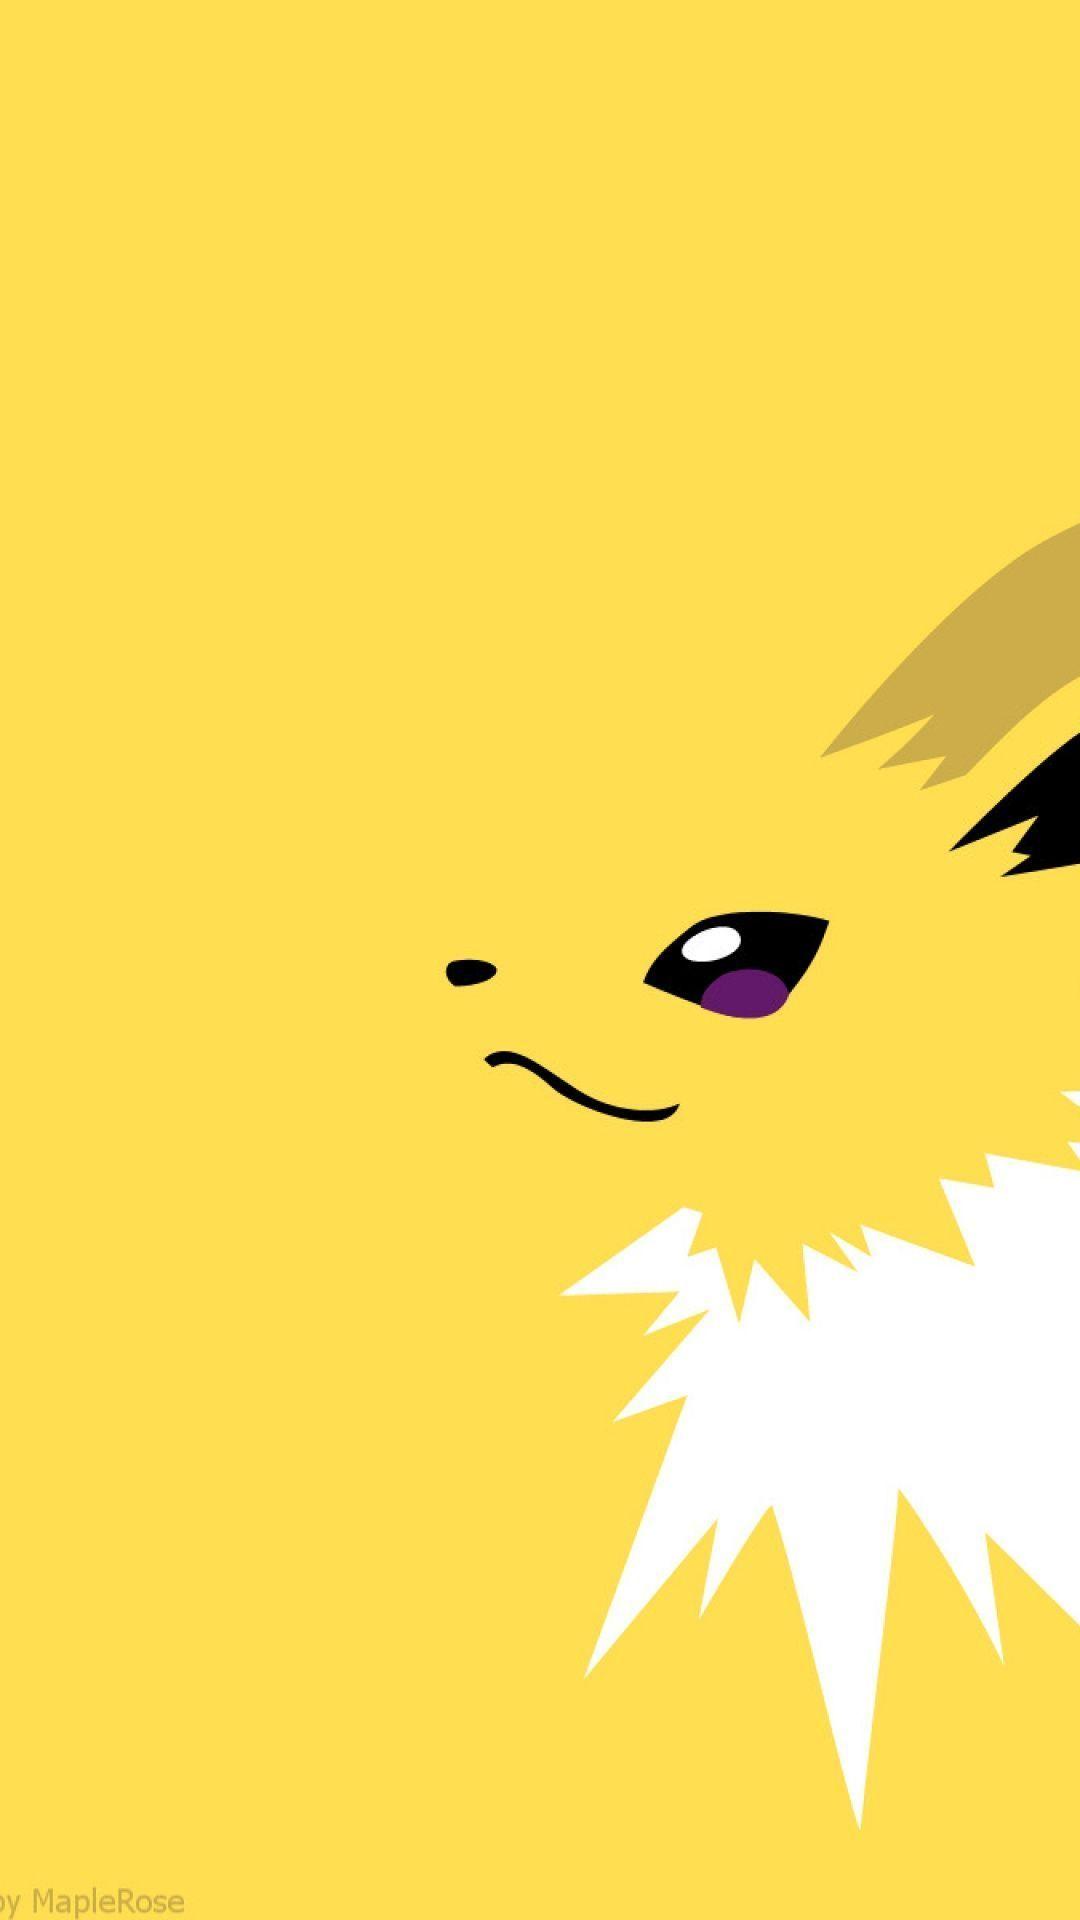 Pokemon Minimalist iPhone 7 wallpaper hd